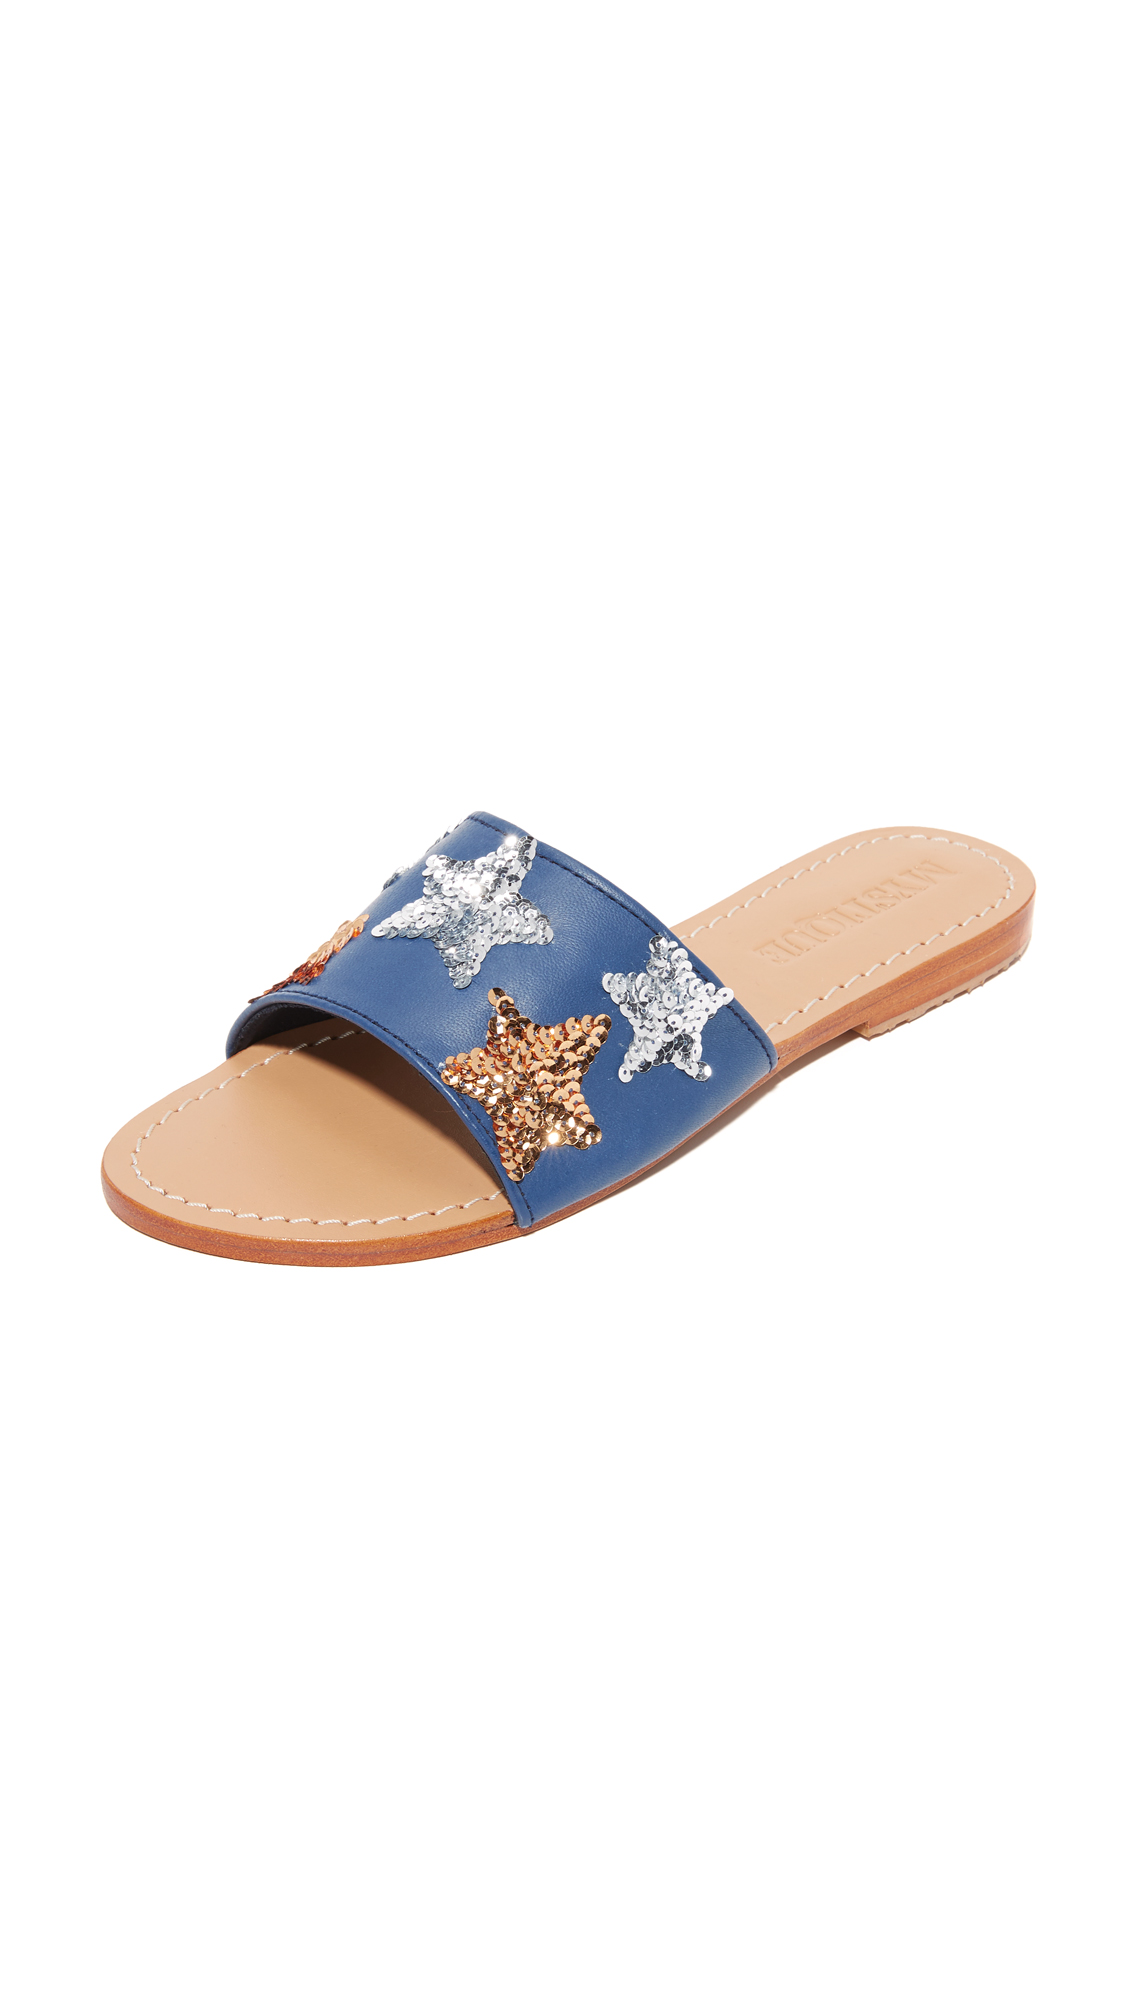 Mystique Star Slides - Navy